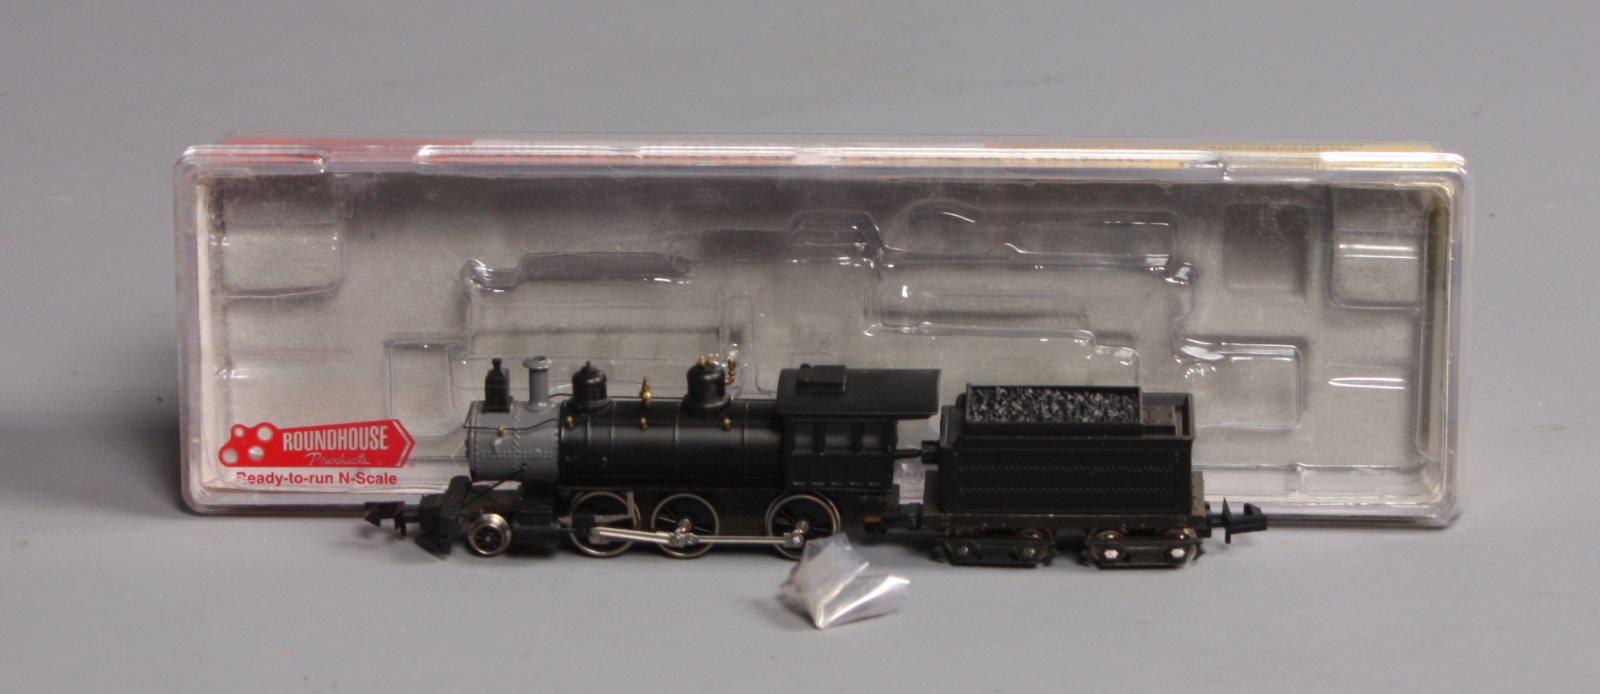 Details about Roundhouse 8050 N Scale Undec 2-6-0 Mogul Steam Engine LN/Box